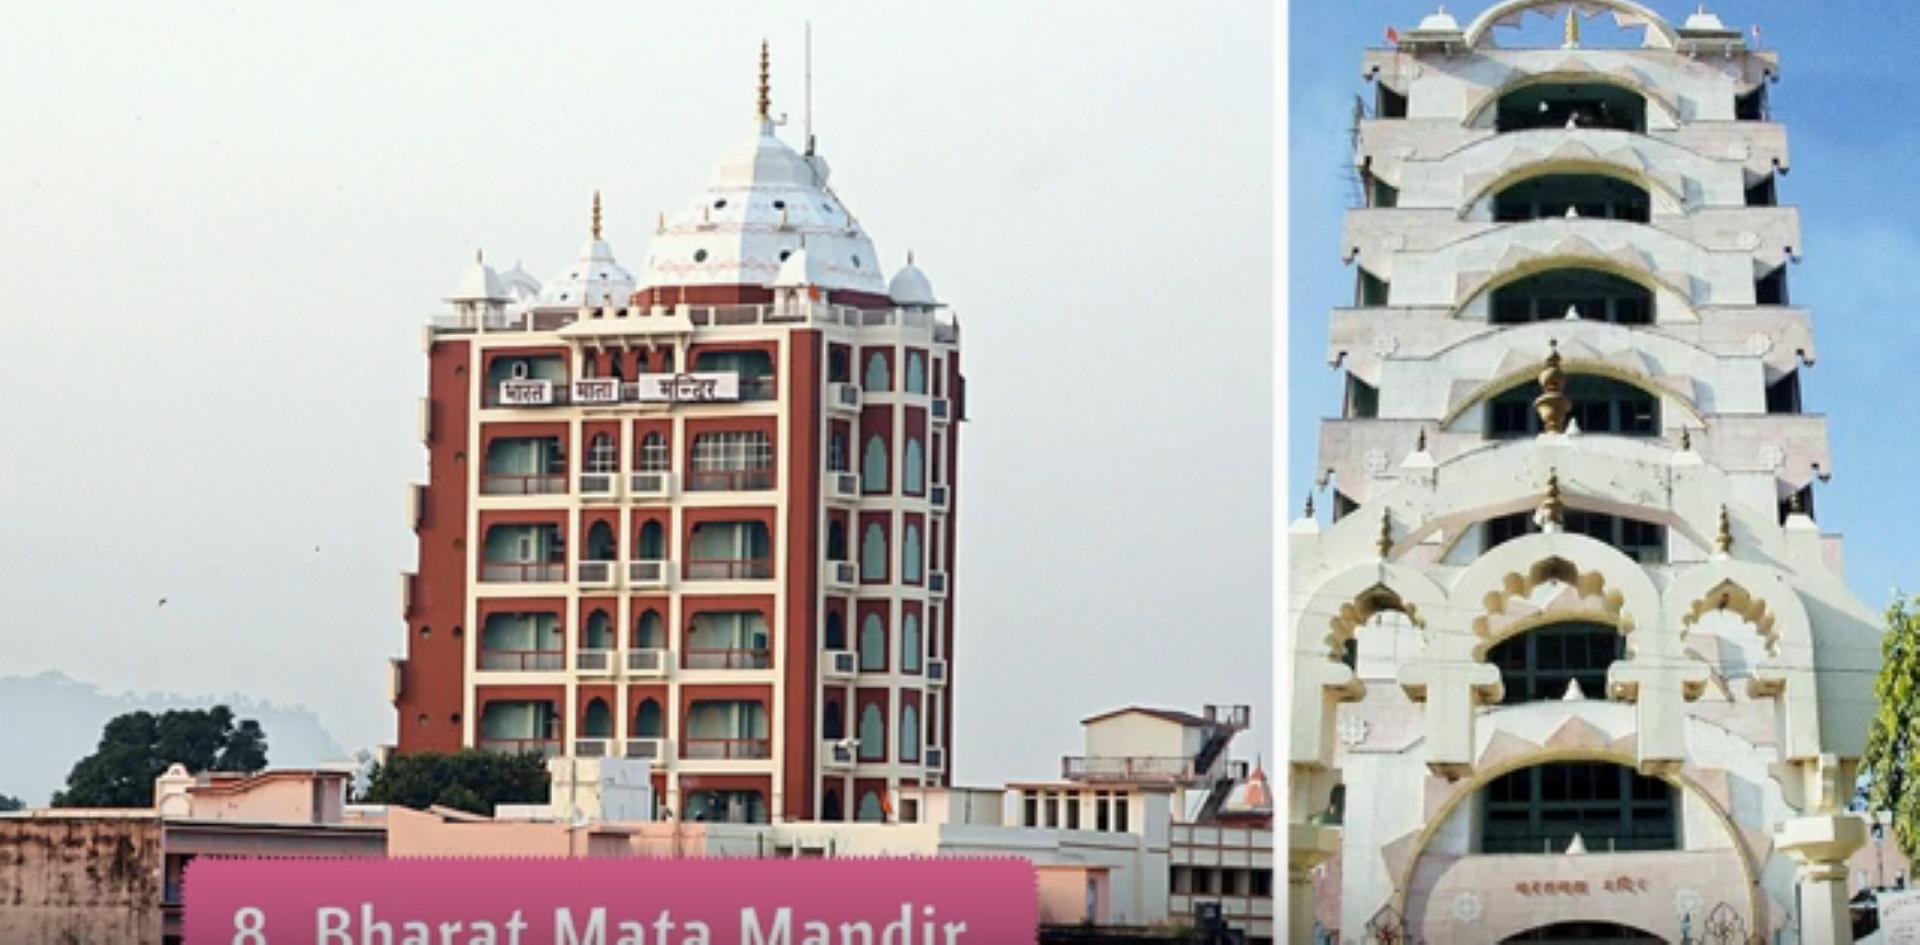 Bharat Mata Mandir tour by tempo traveller